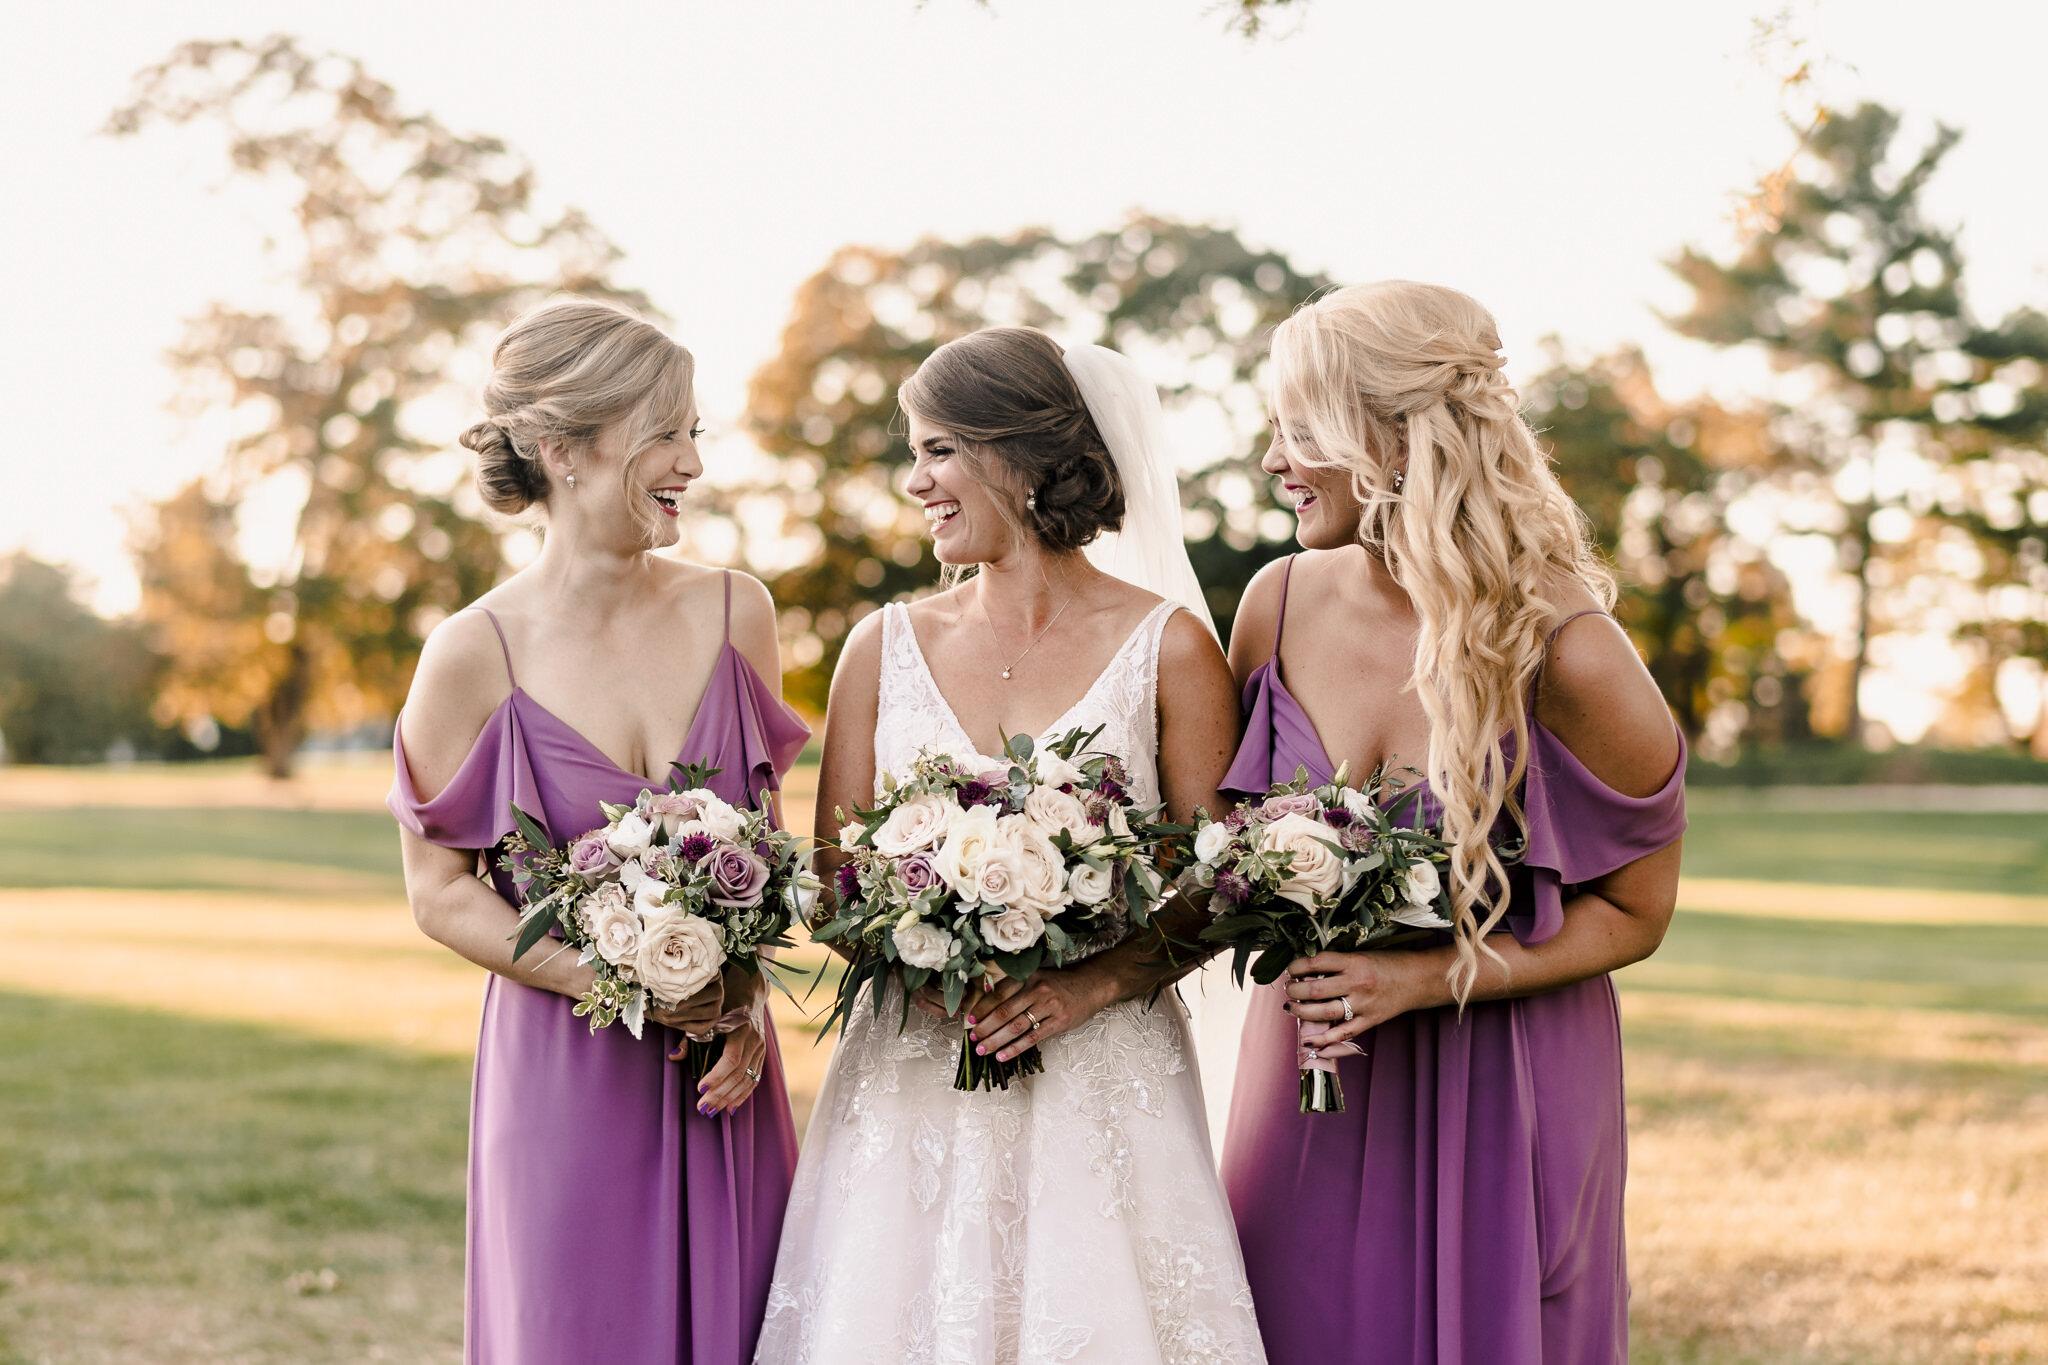 Coyle-Forsgate-Country-Club-Wedding-Photographer-17.JPG